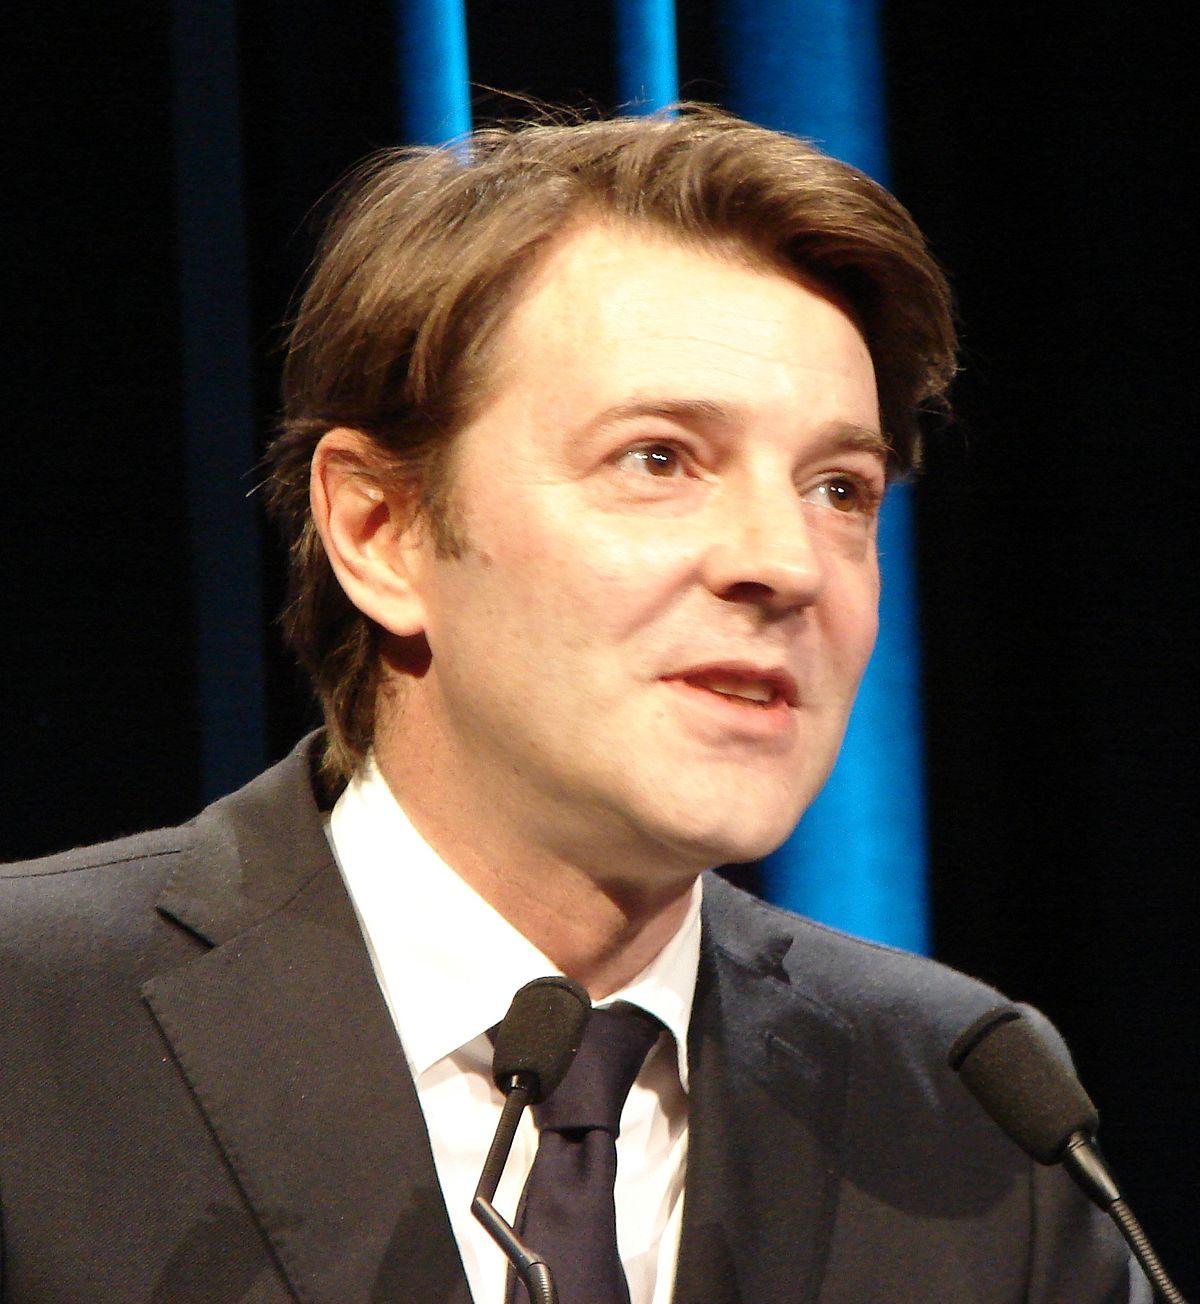 About: François Baroin